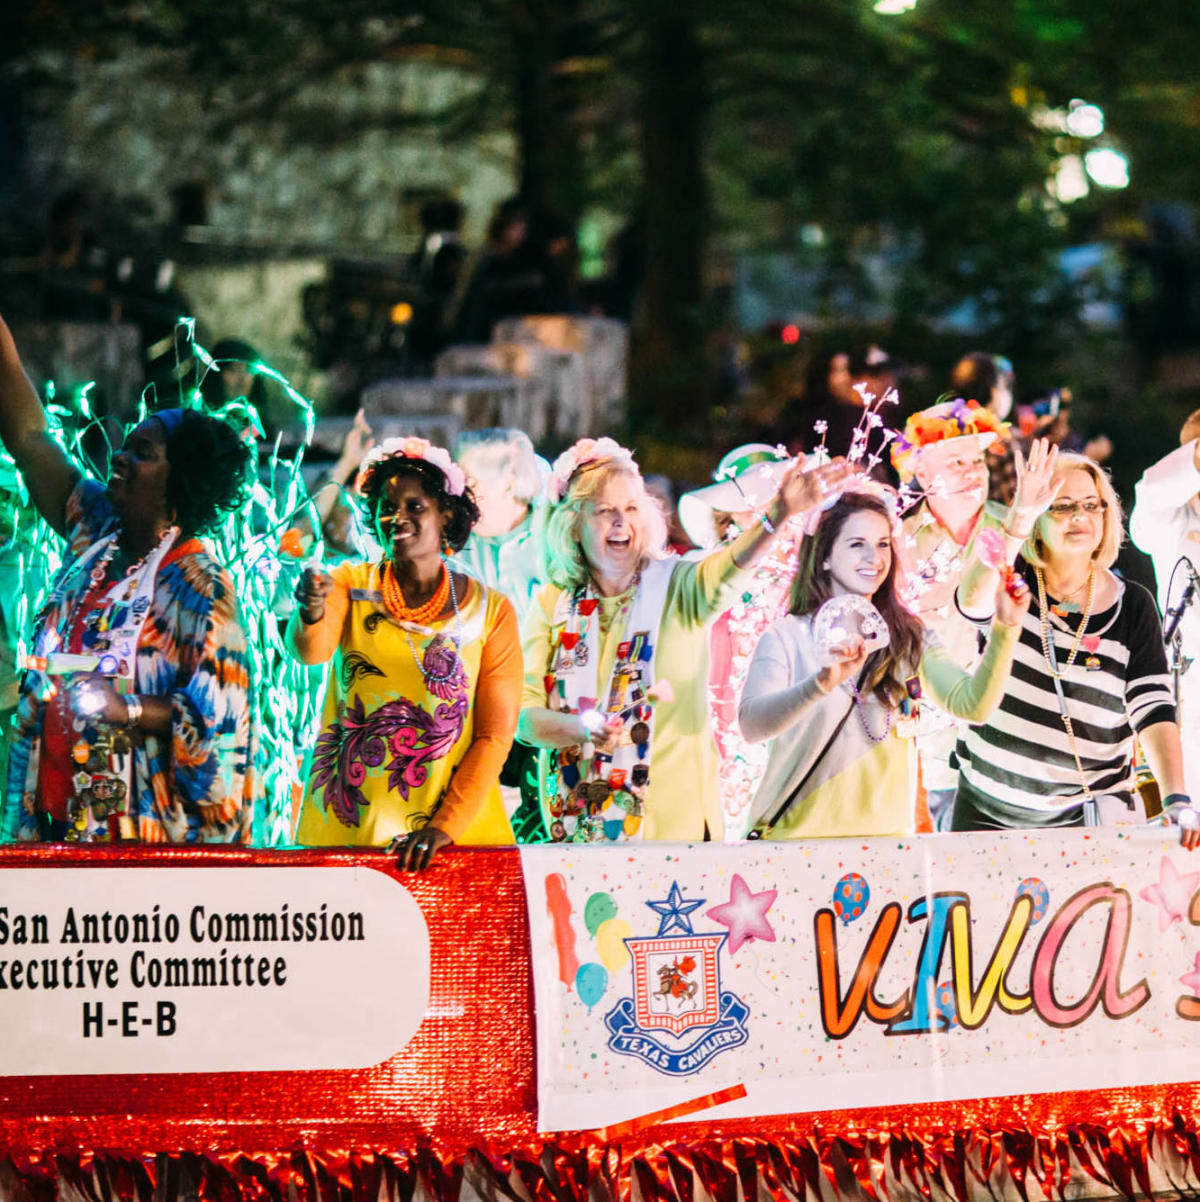 Texas Cavaliers River Parade — Fiesta